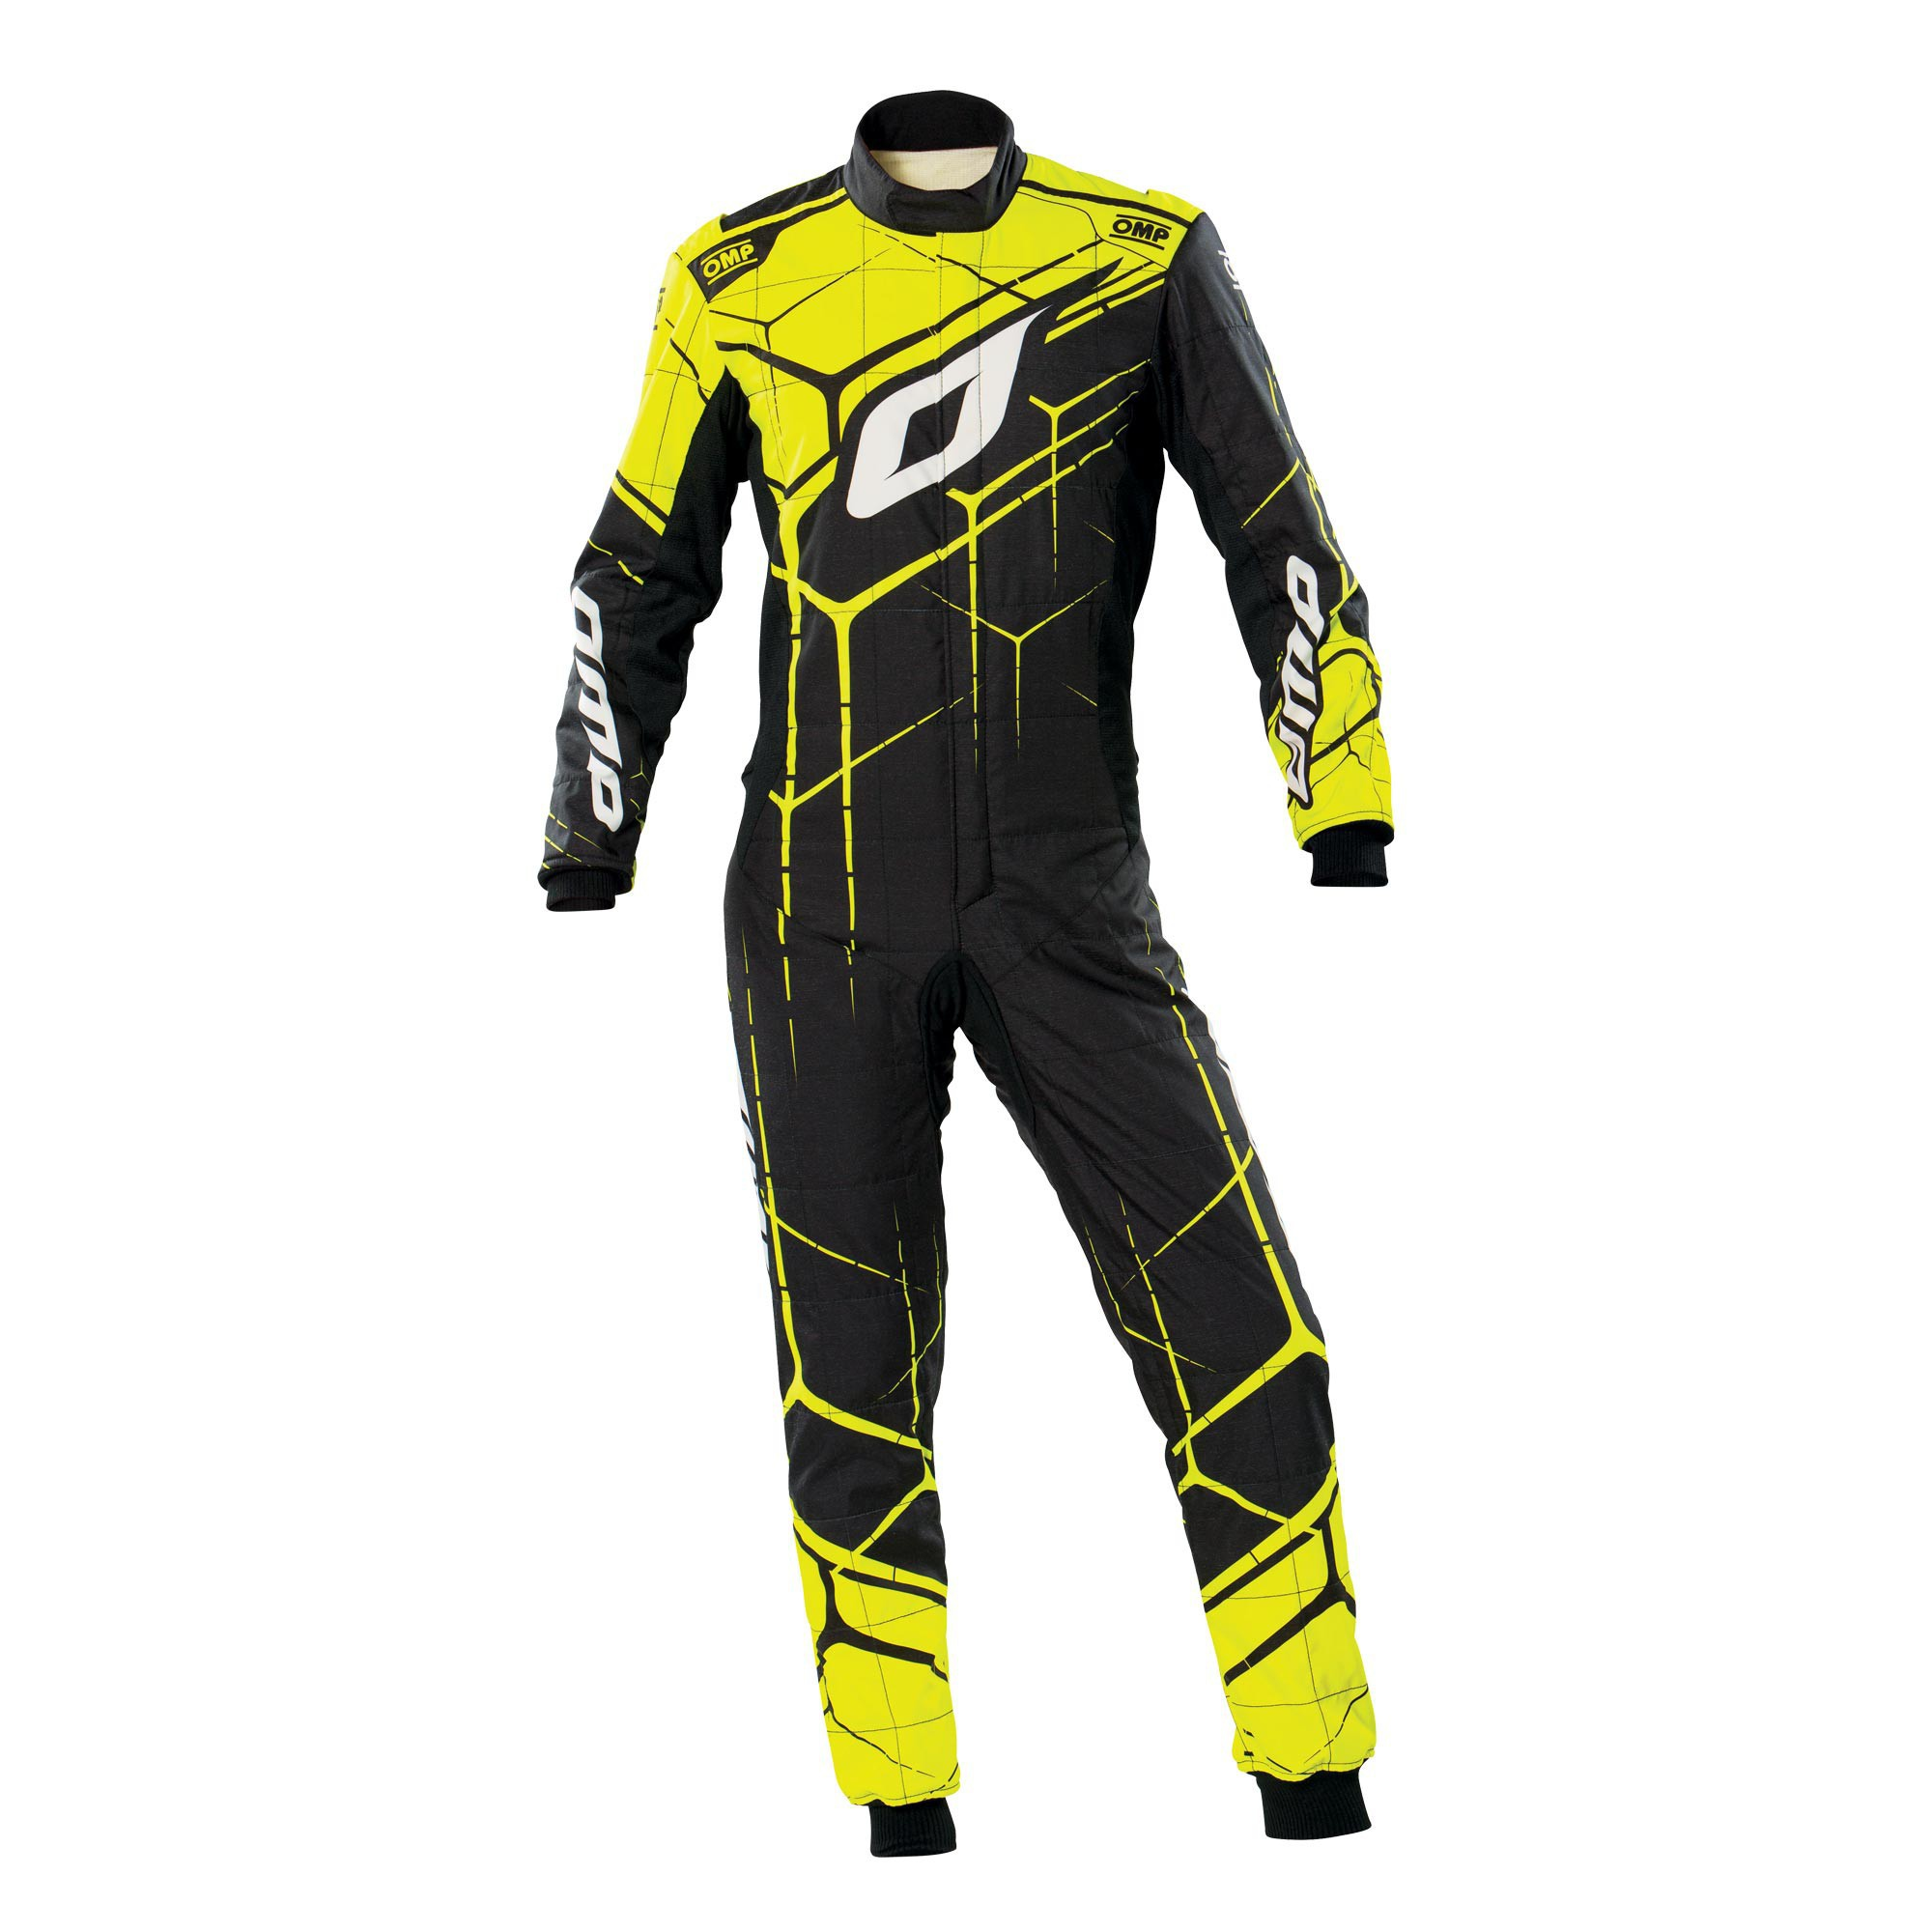 Macacão Racing One Art OMP 2020